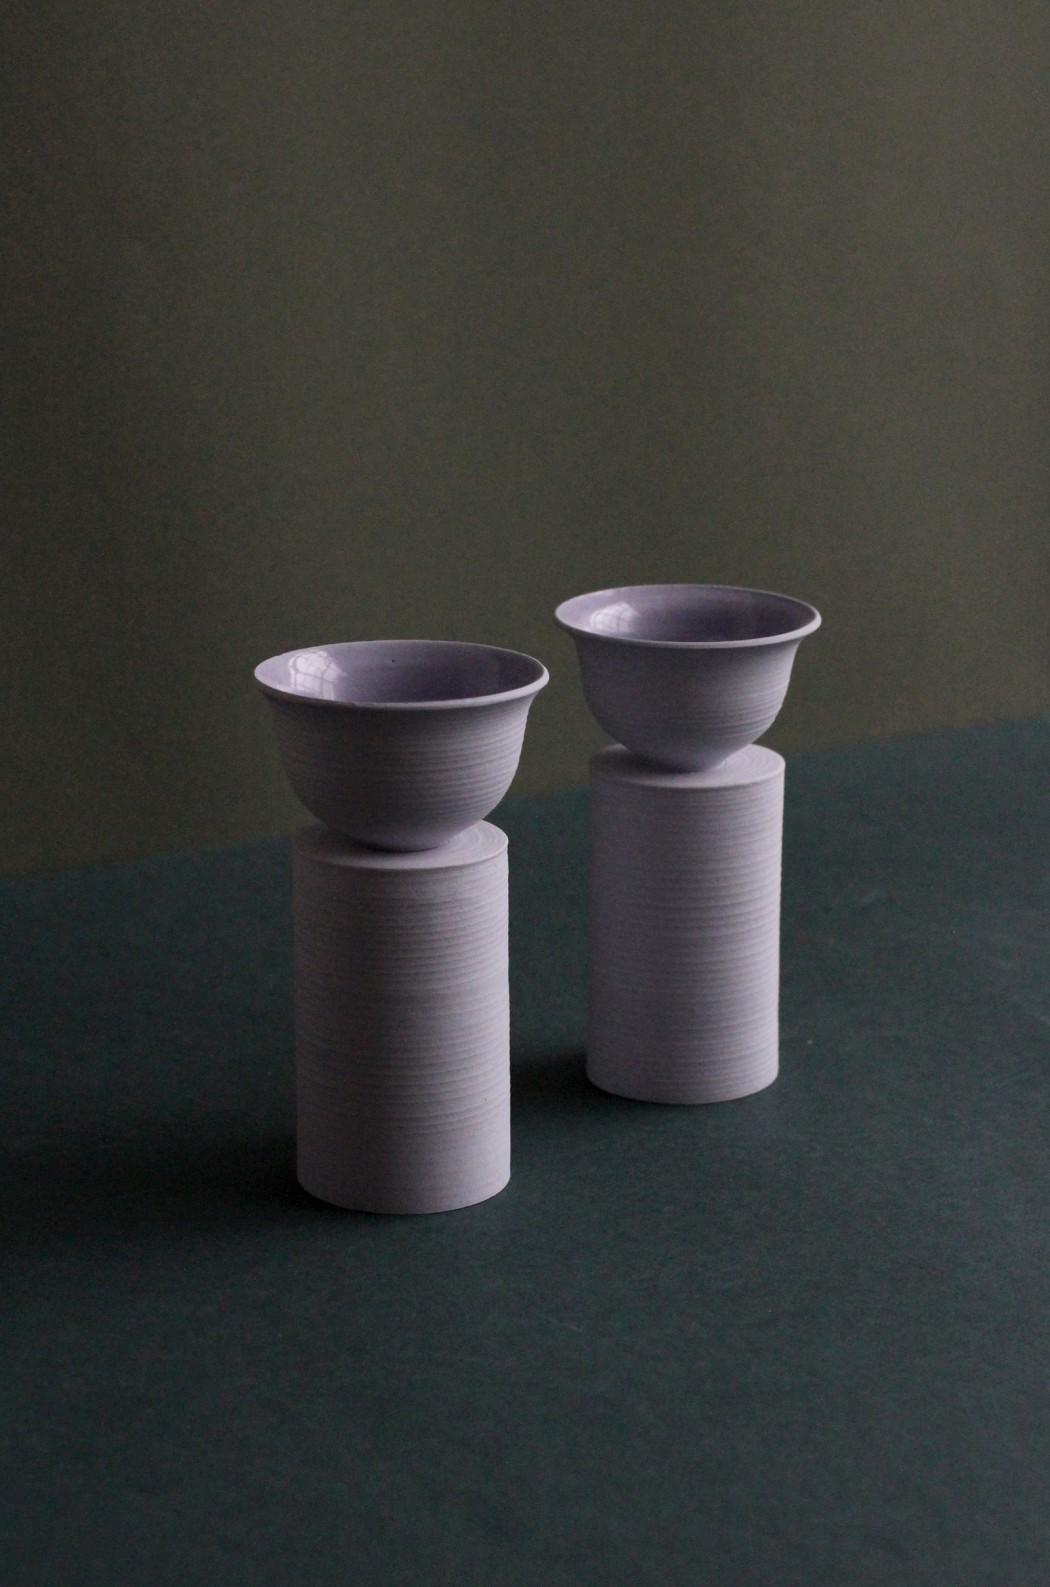 Design-Natalie-Weinberger-Ceramics-14-1-1050x1587